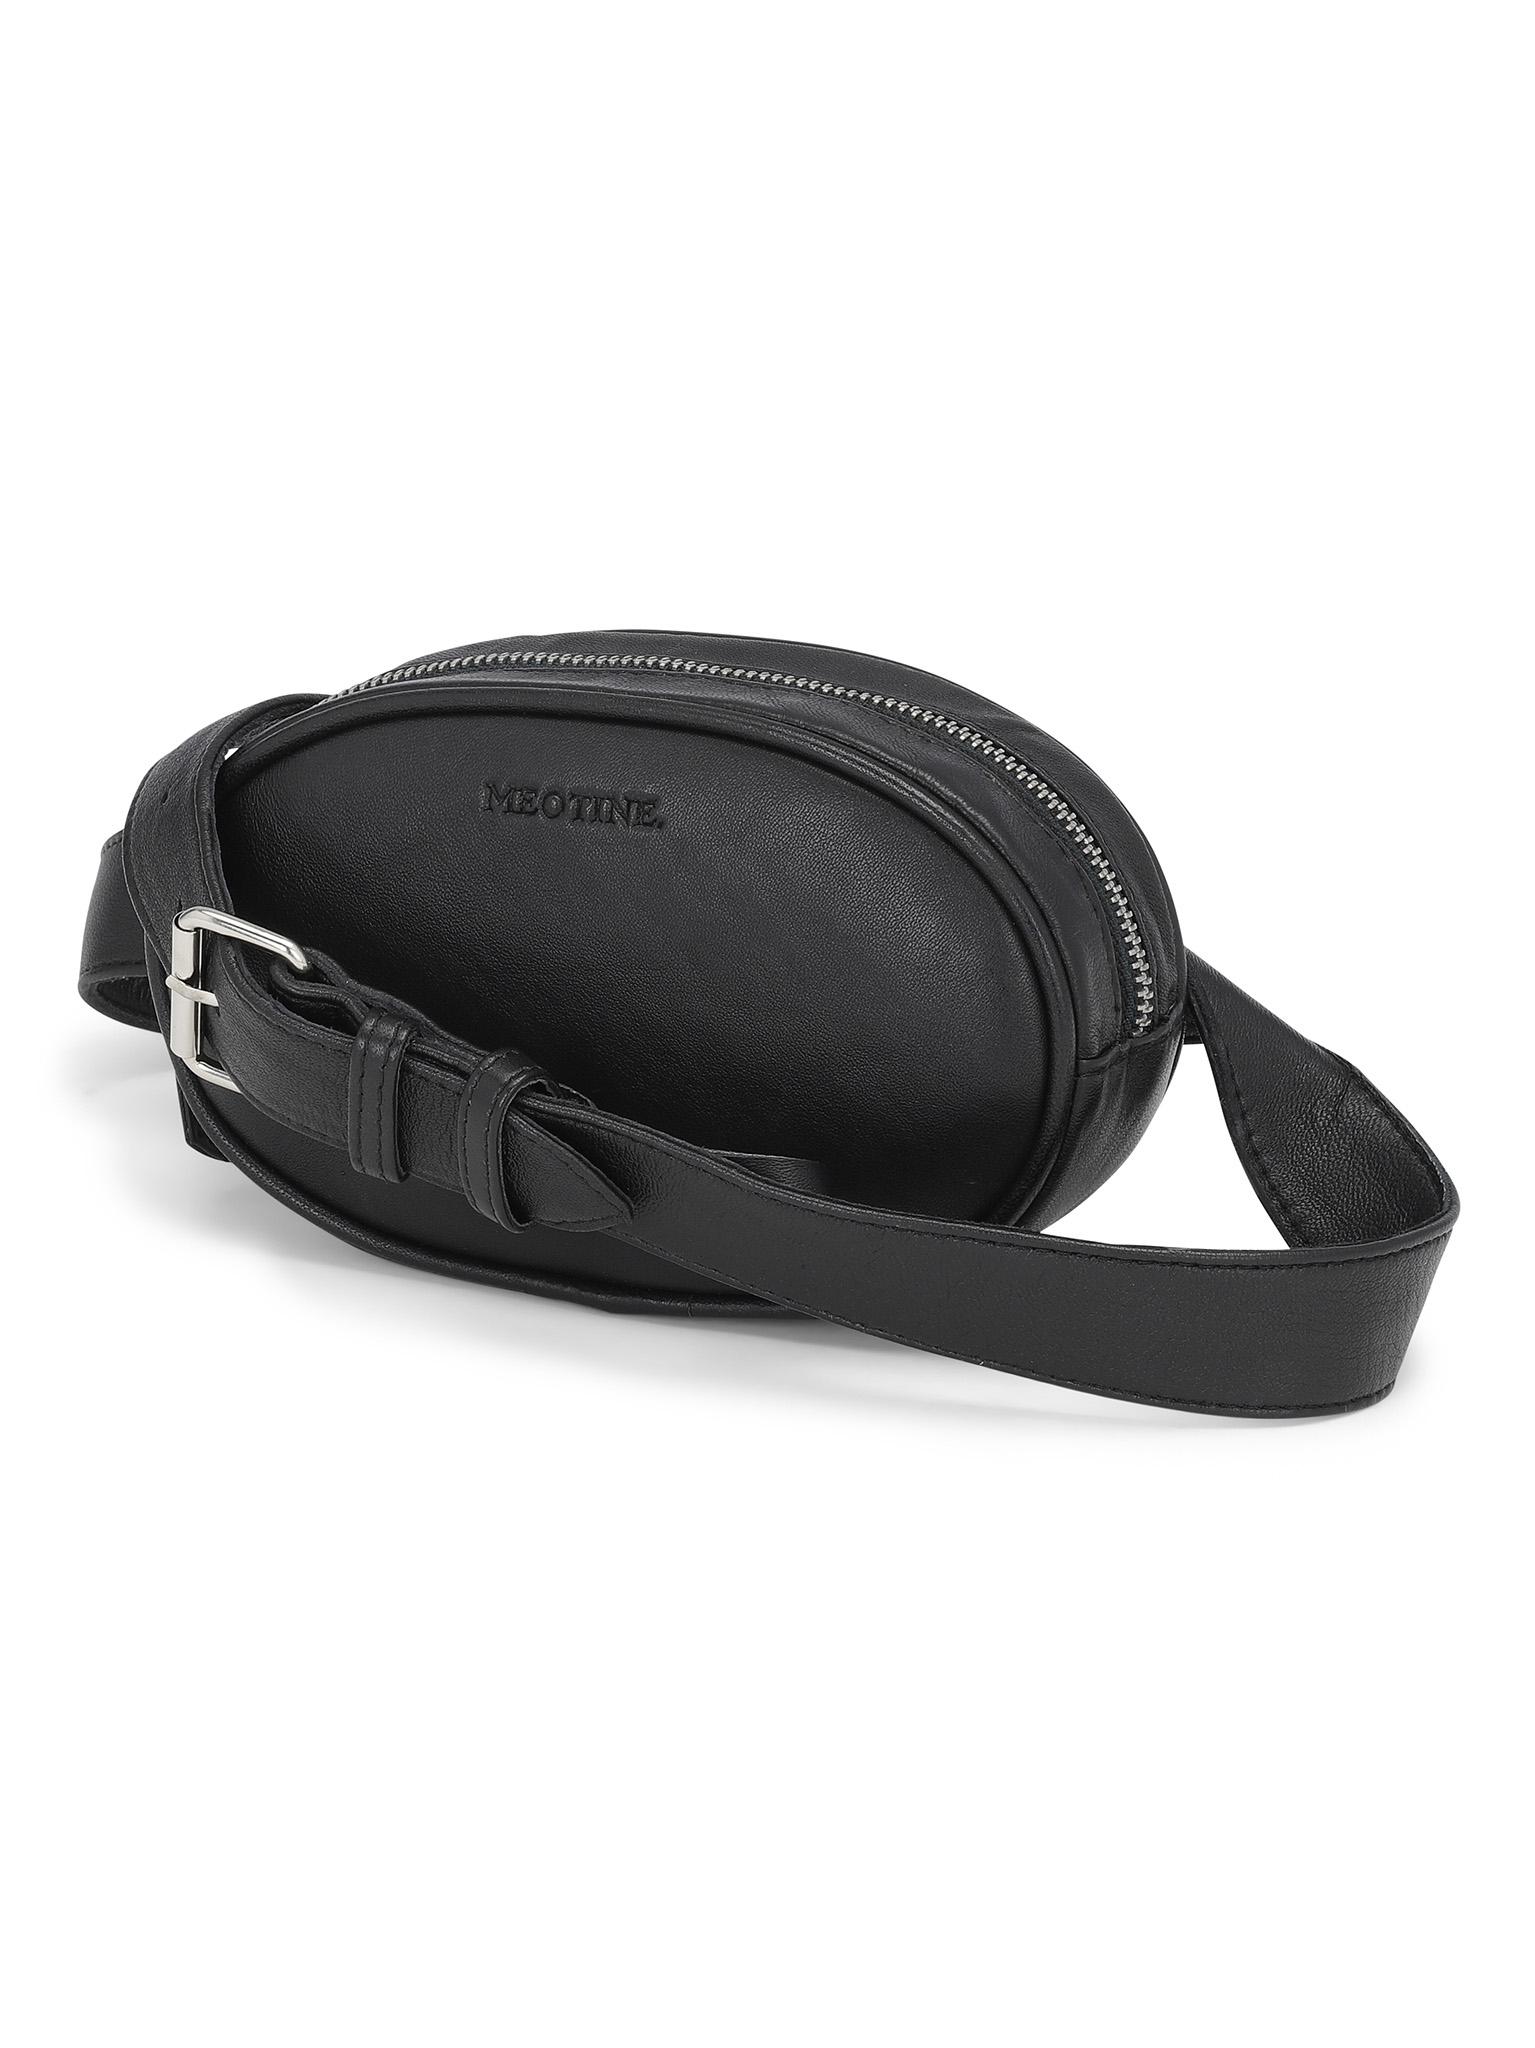 Meotine Leather Bum Bag, Black